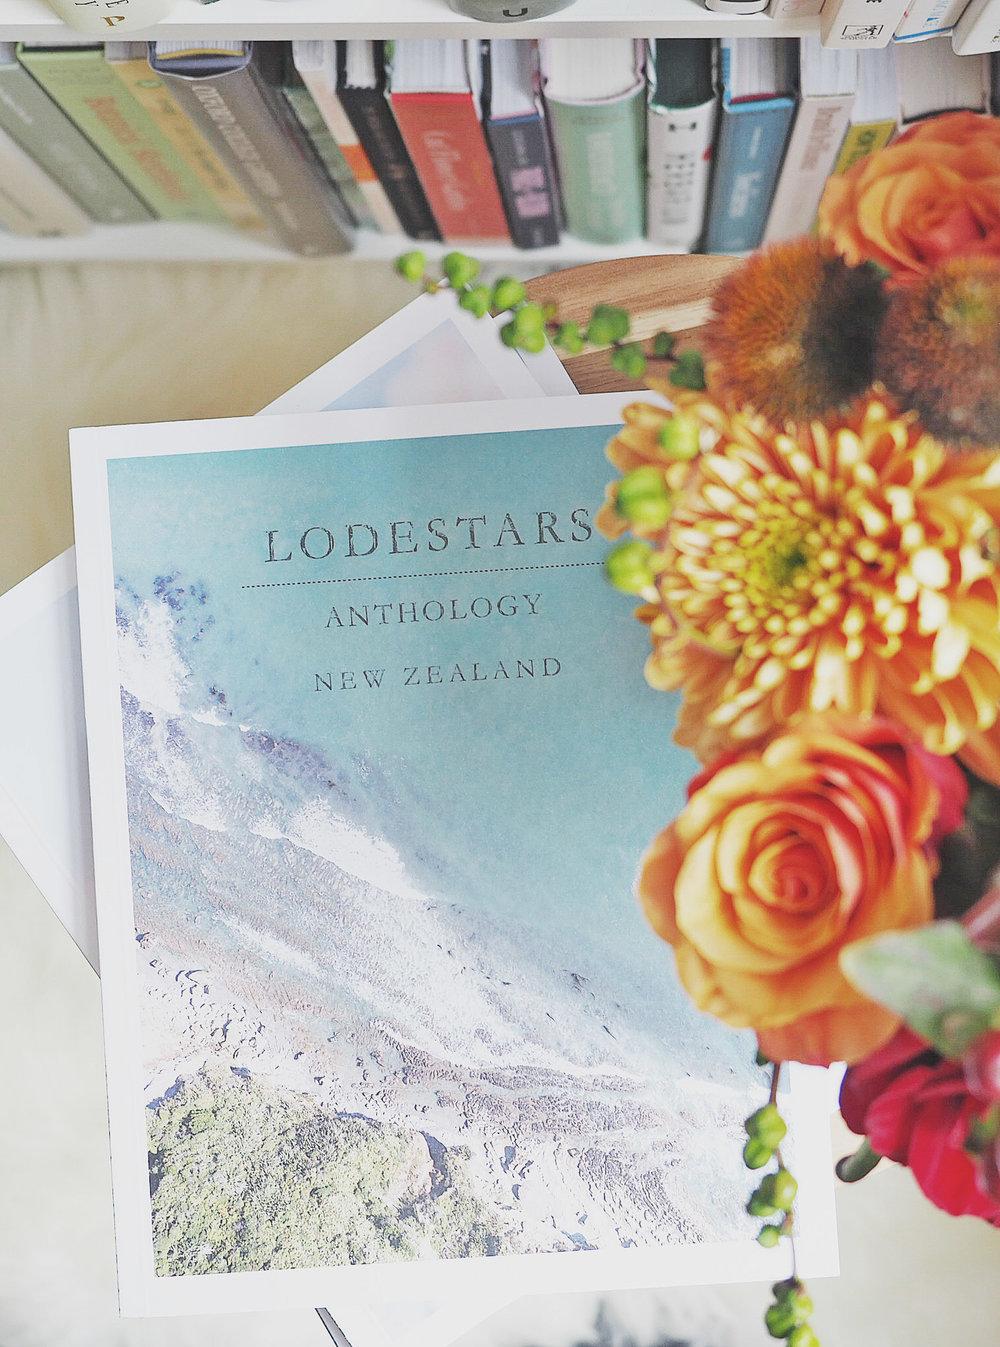 lodestars_2.jpg